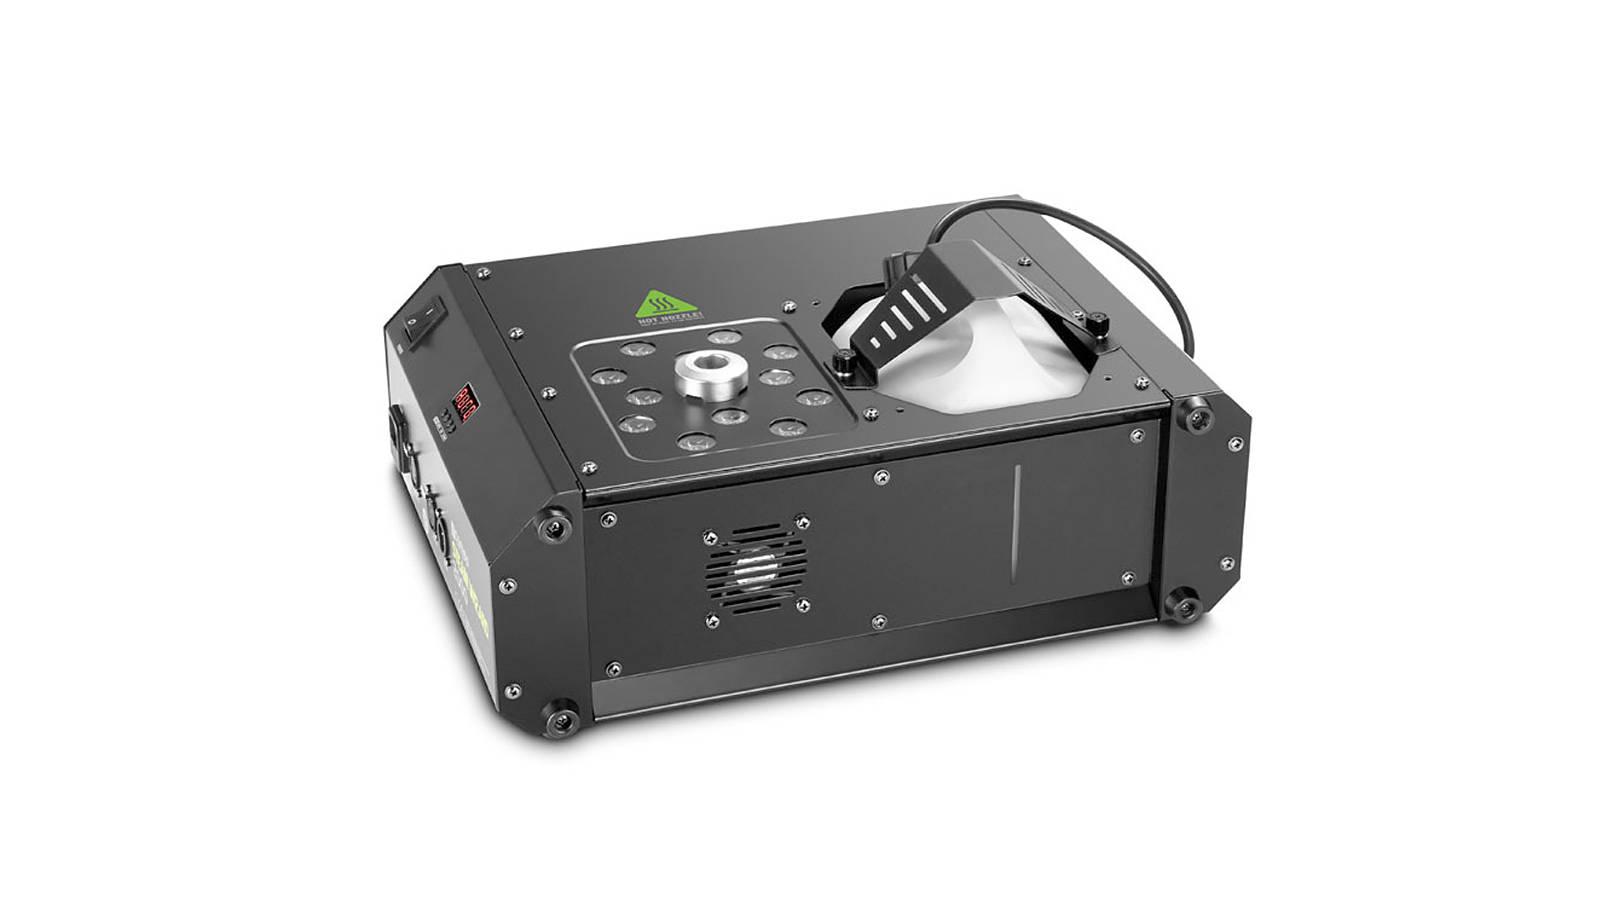 Cameo Steam Wizard 2000 Nebelmaschine mit RGBA-LEDs